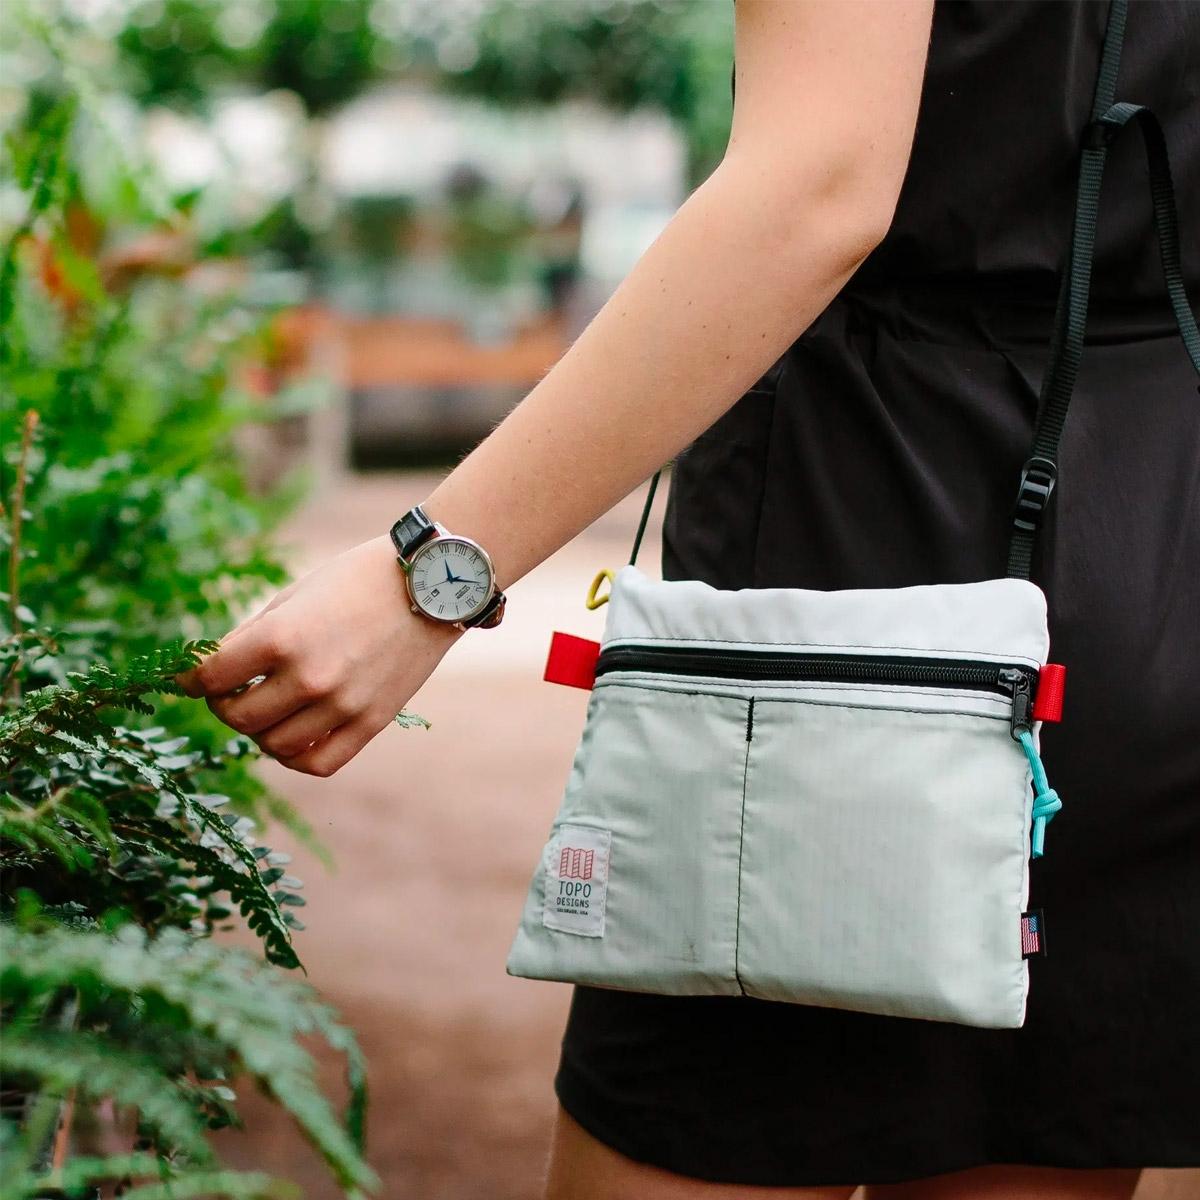 Topo Designs Accessory Shoulder Bag Black, kleine crossbody tas met externe vakken voor telefoon of sleutels